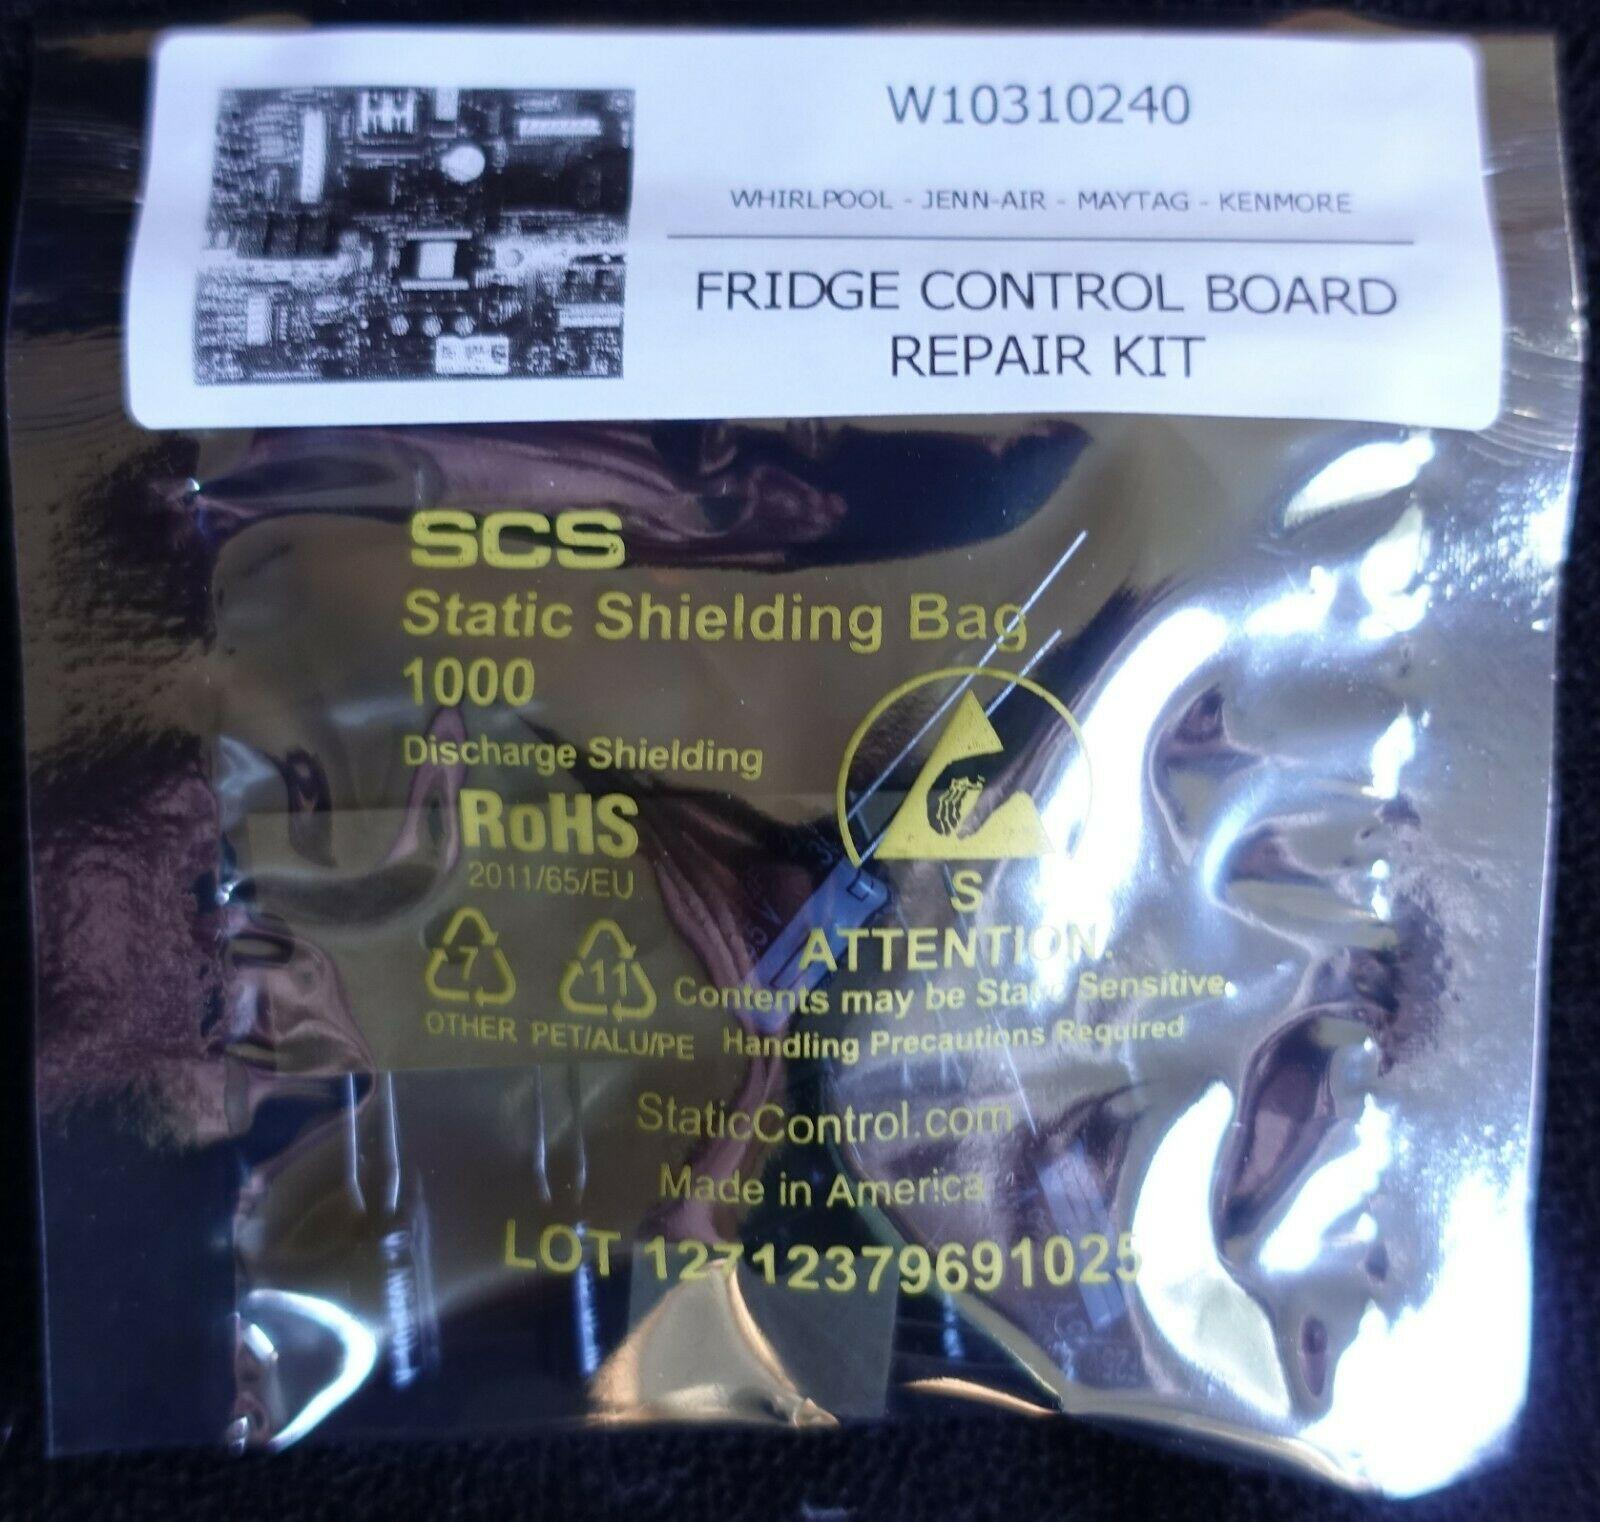 Fridge Control Board Repair Kit W10310240 W10213583 WPW10312695 Maytag JennAir